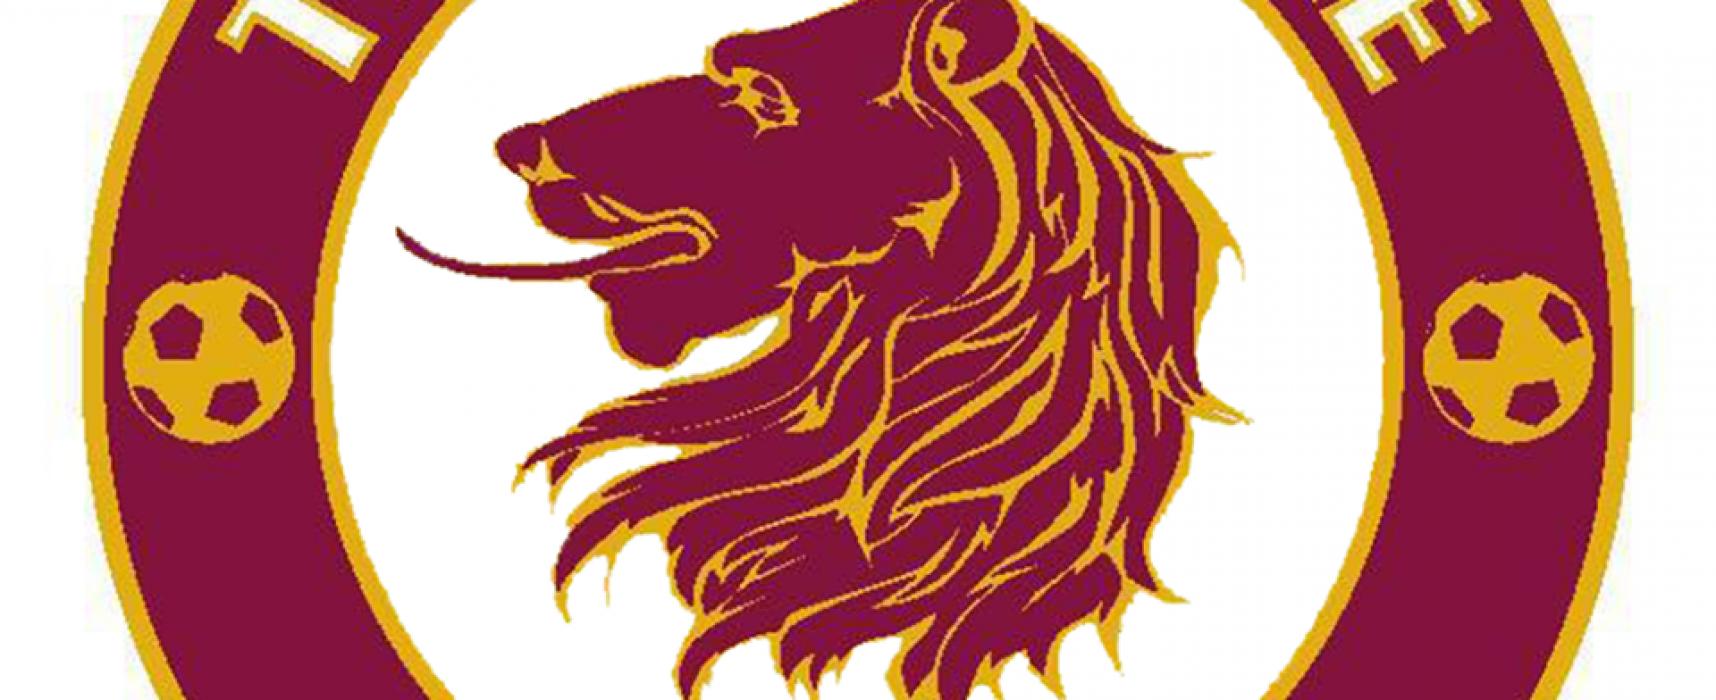 Trastevere-Aprilia 2-0, i leoni guadagnano tre punti fra le mura dello Stadium